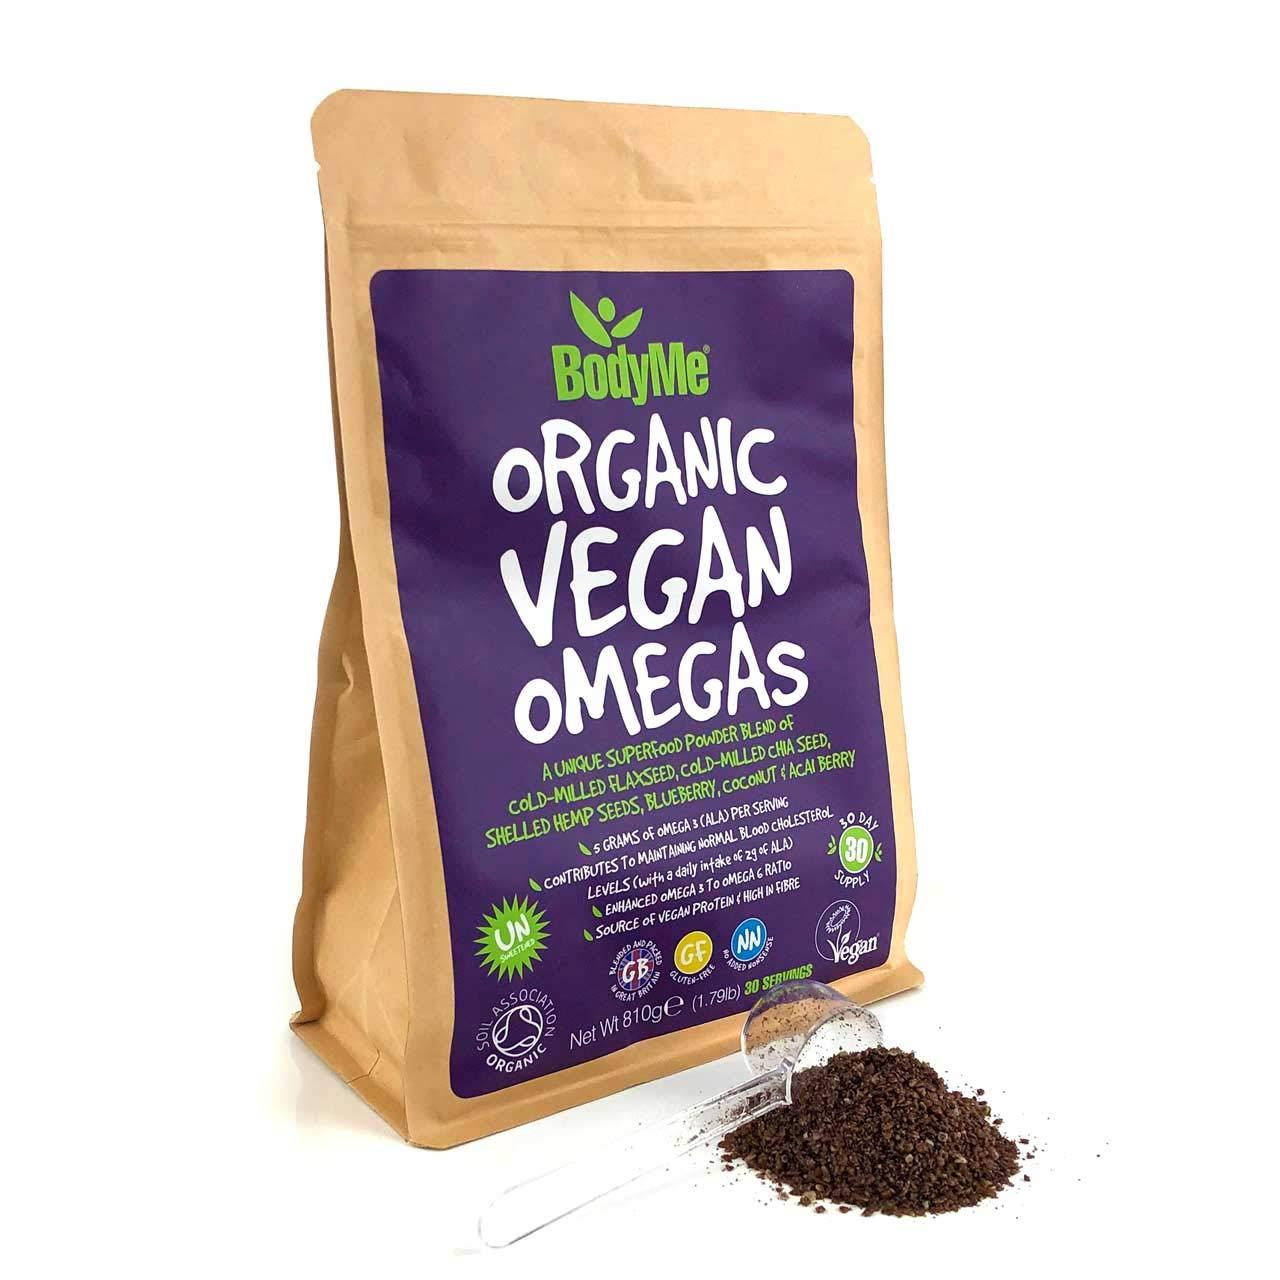 BodyMe Orgánico Vegano Omegas Polvo | 810g | Vegan Omega 3 6 ...